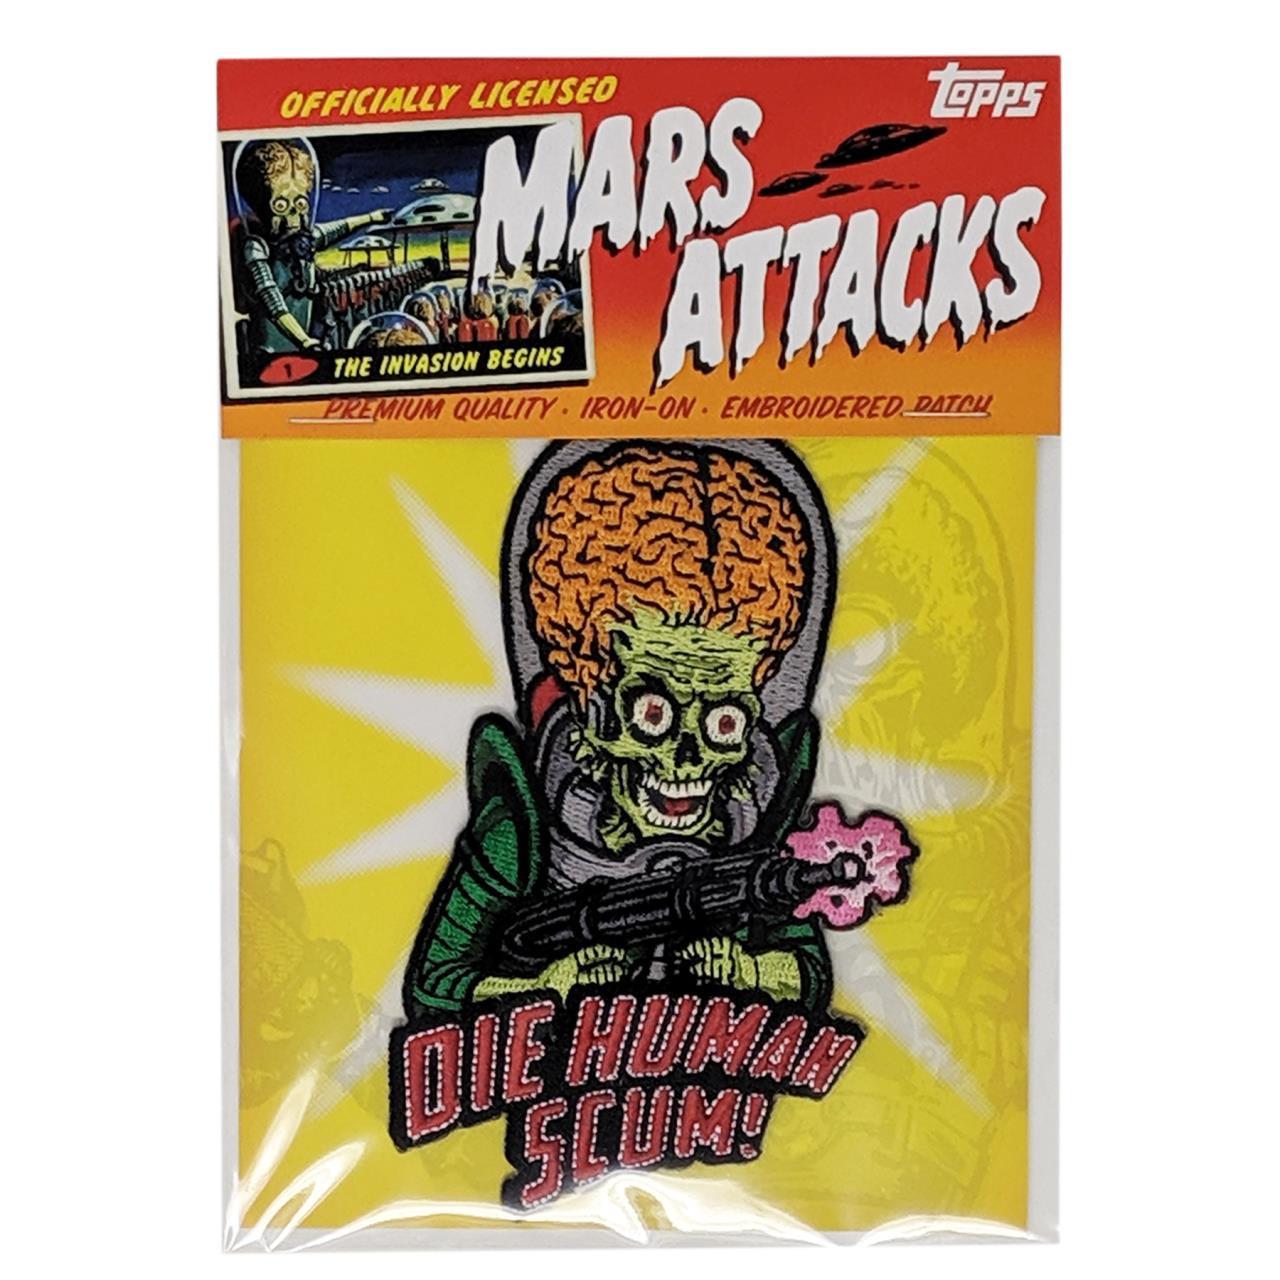 Mars Attacks Human Scum Patch* -